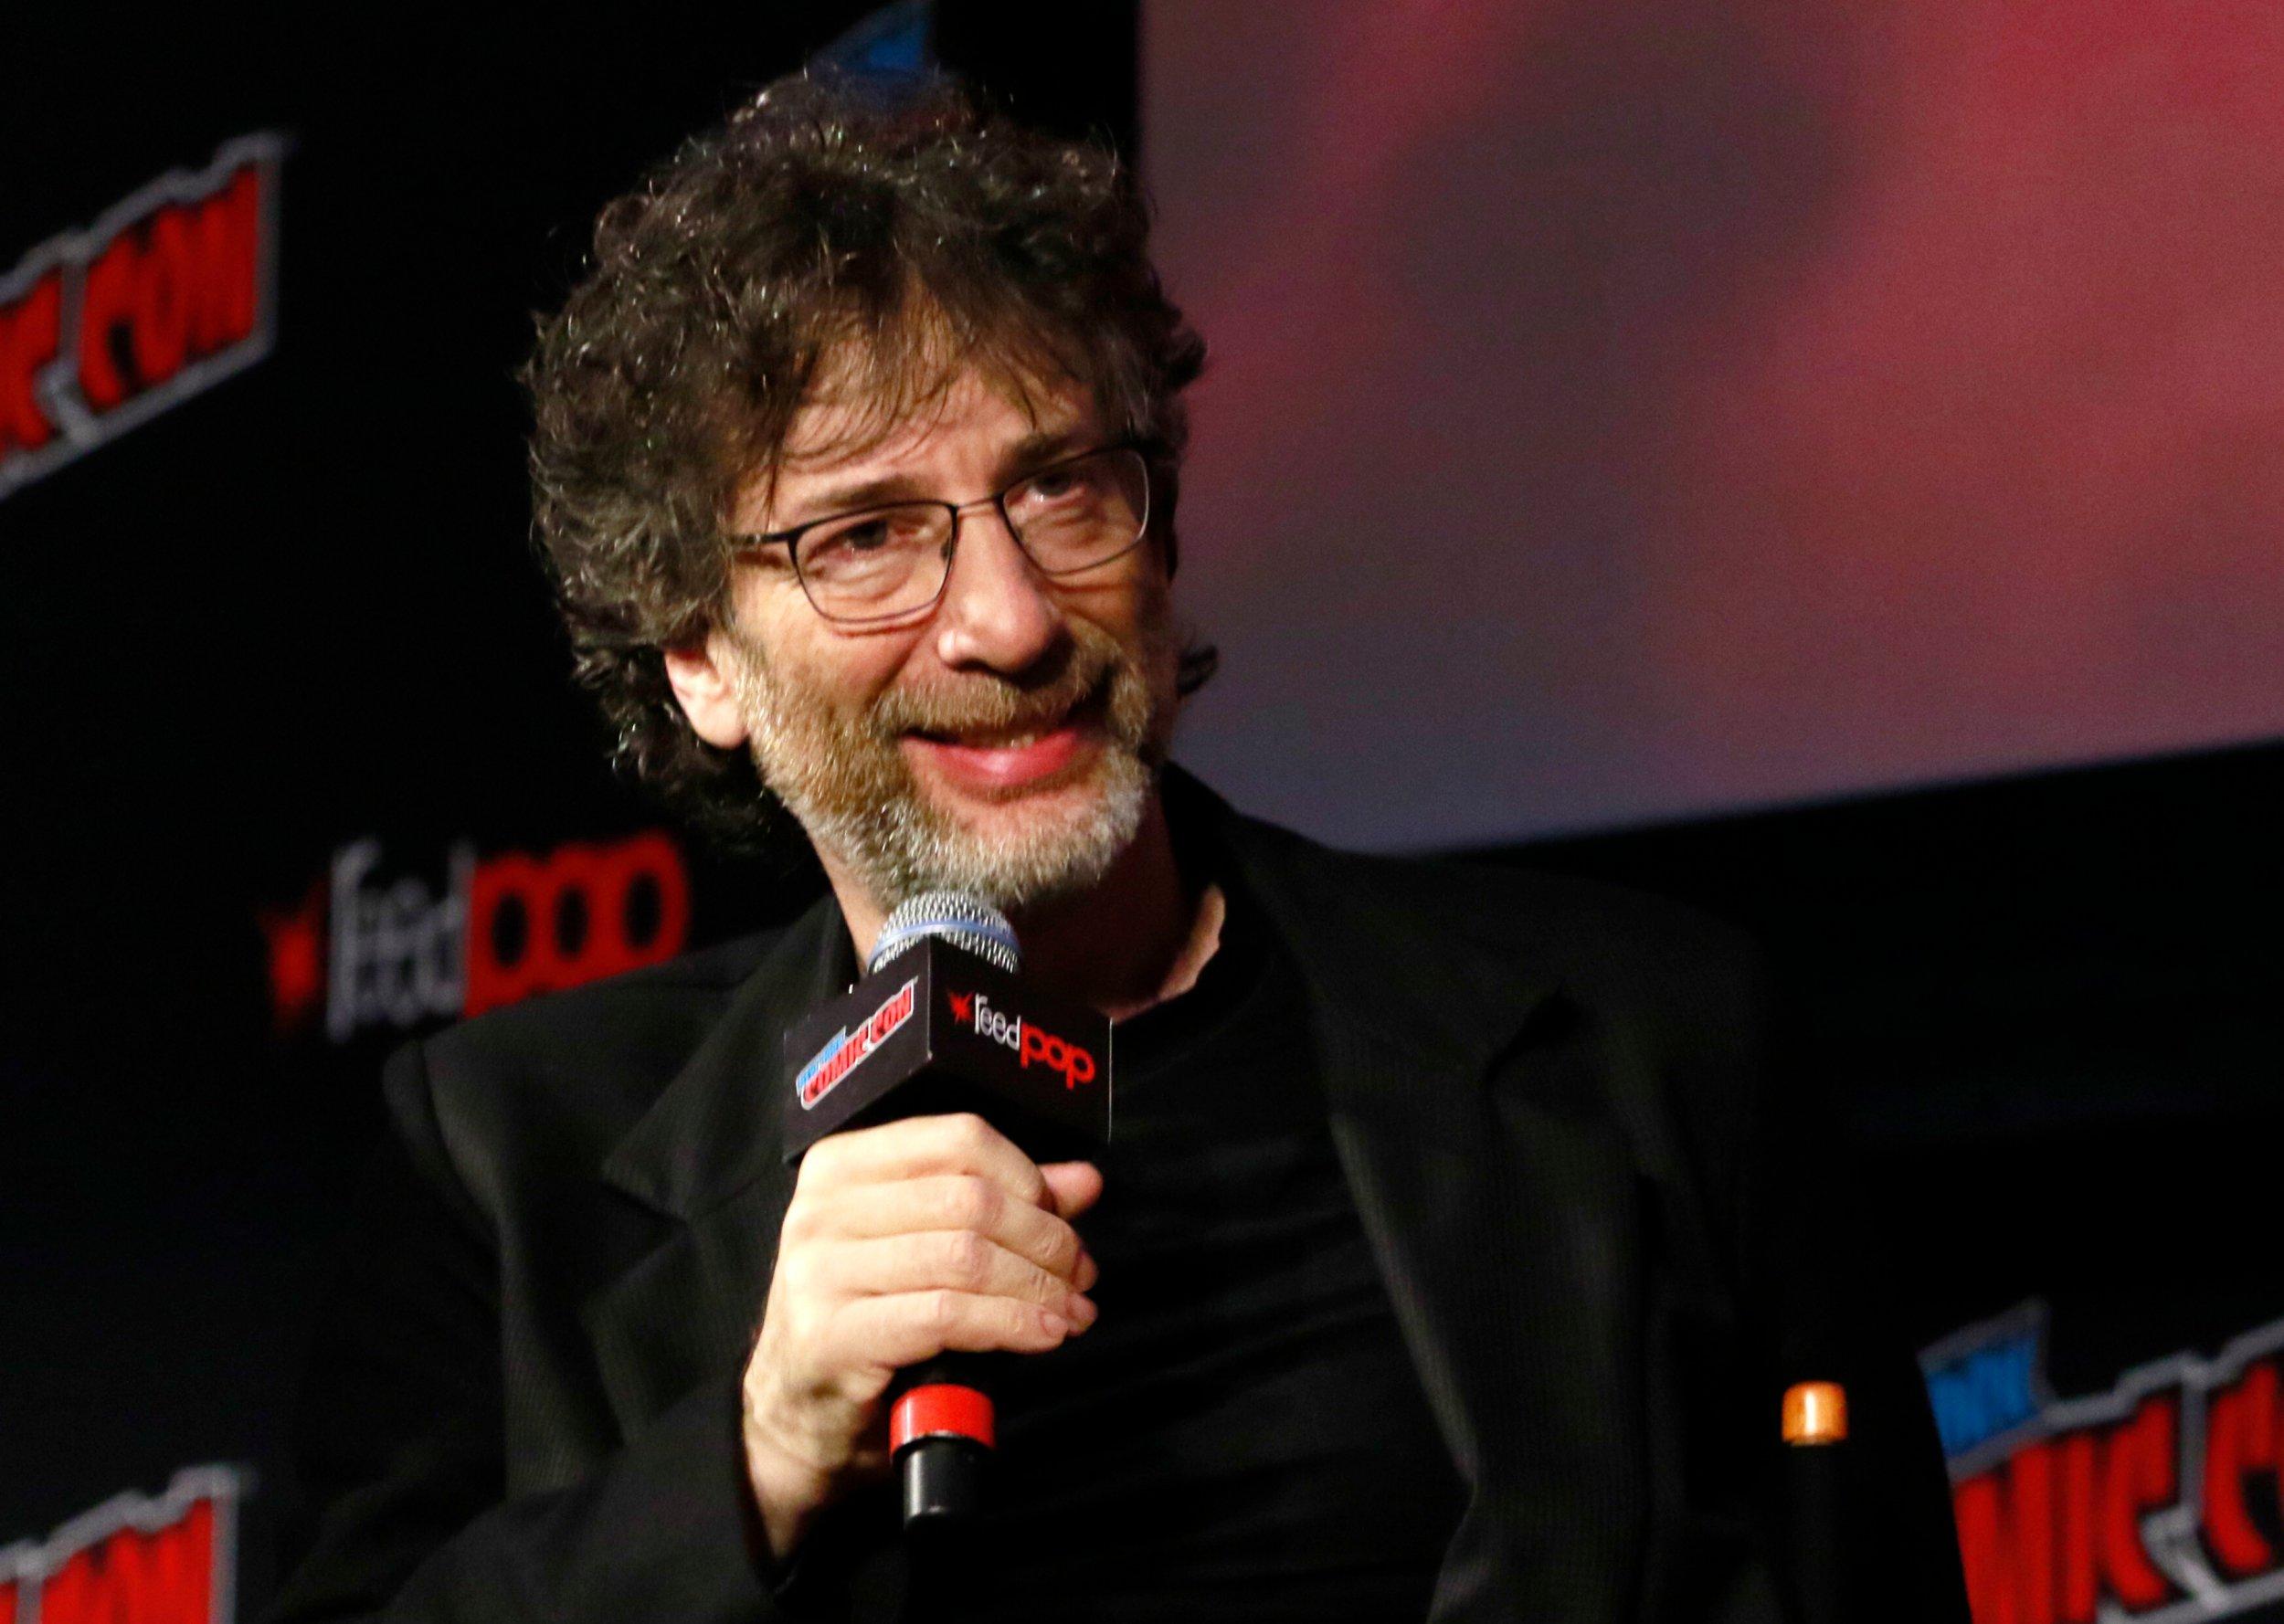 Mandatory Credit: Photo by MediaPunch/REX/Shutterstock (9916318o) Neil Gaiman 'Good Omens' TV show panel, New York Comic Con, USA - 06 Oct 2018